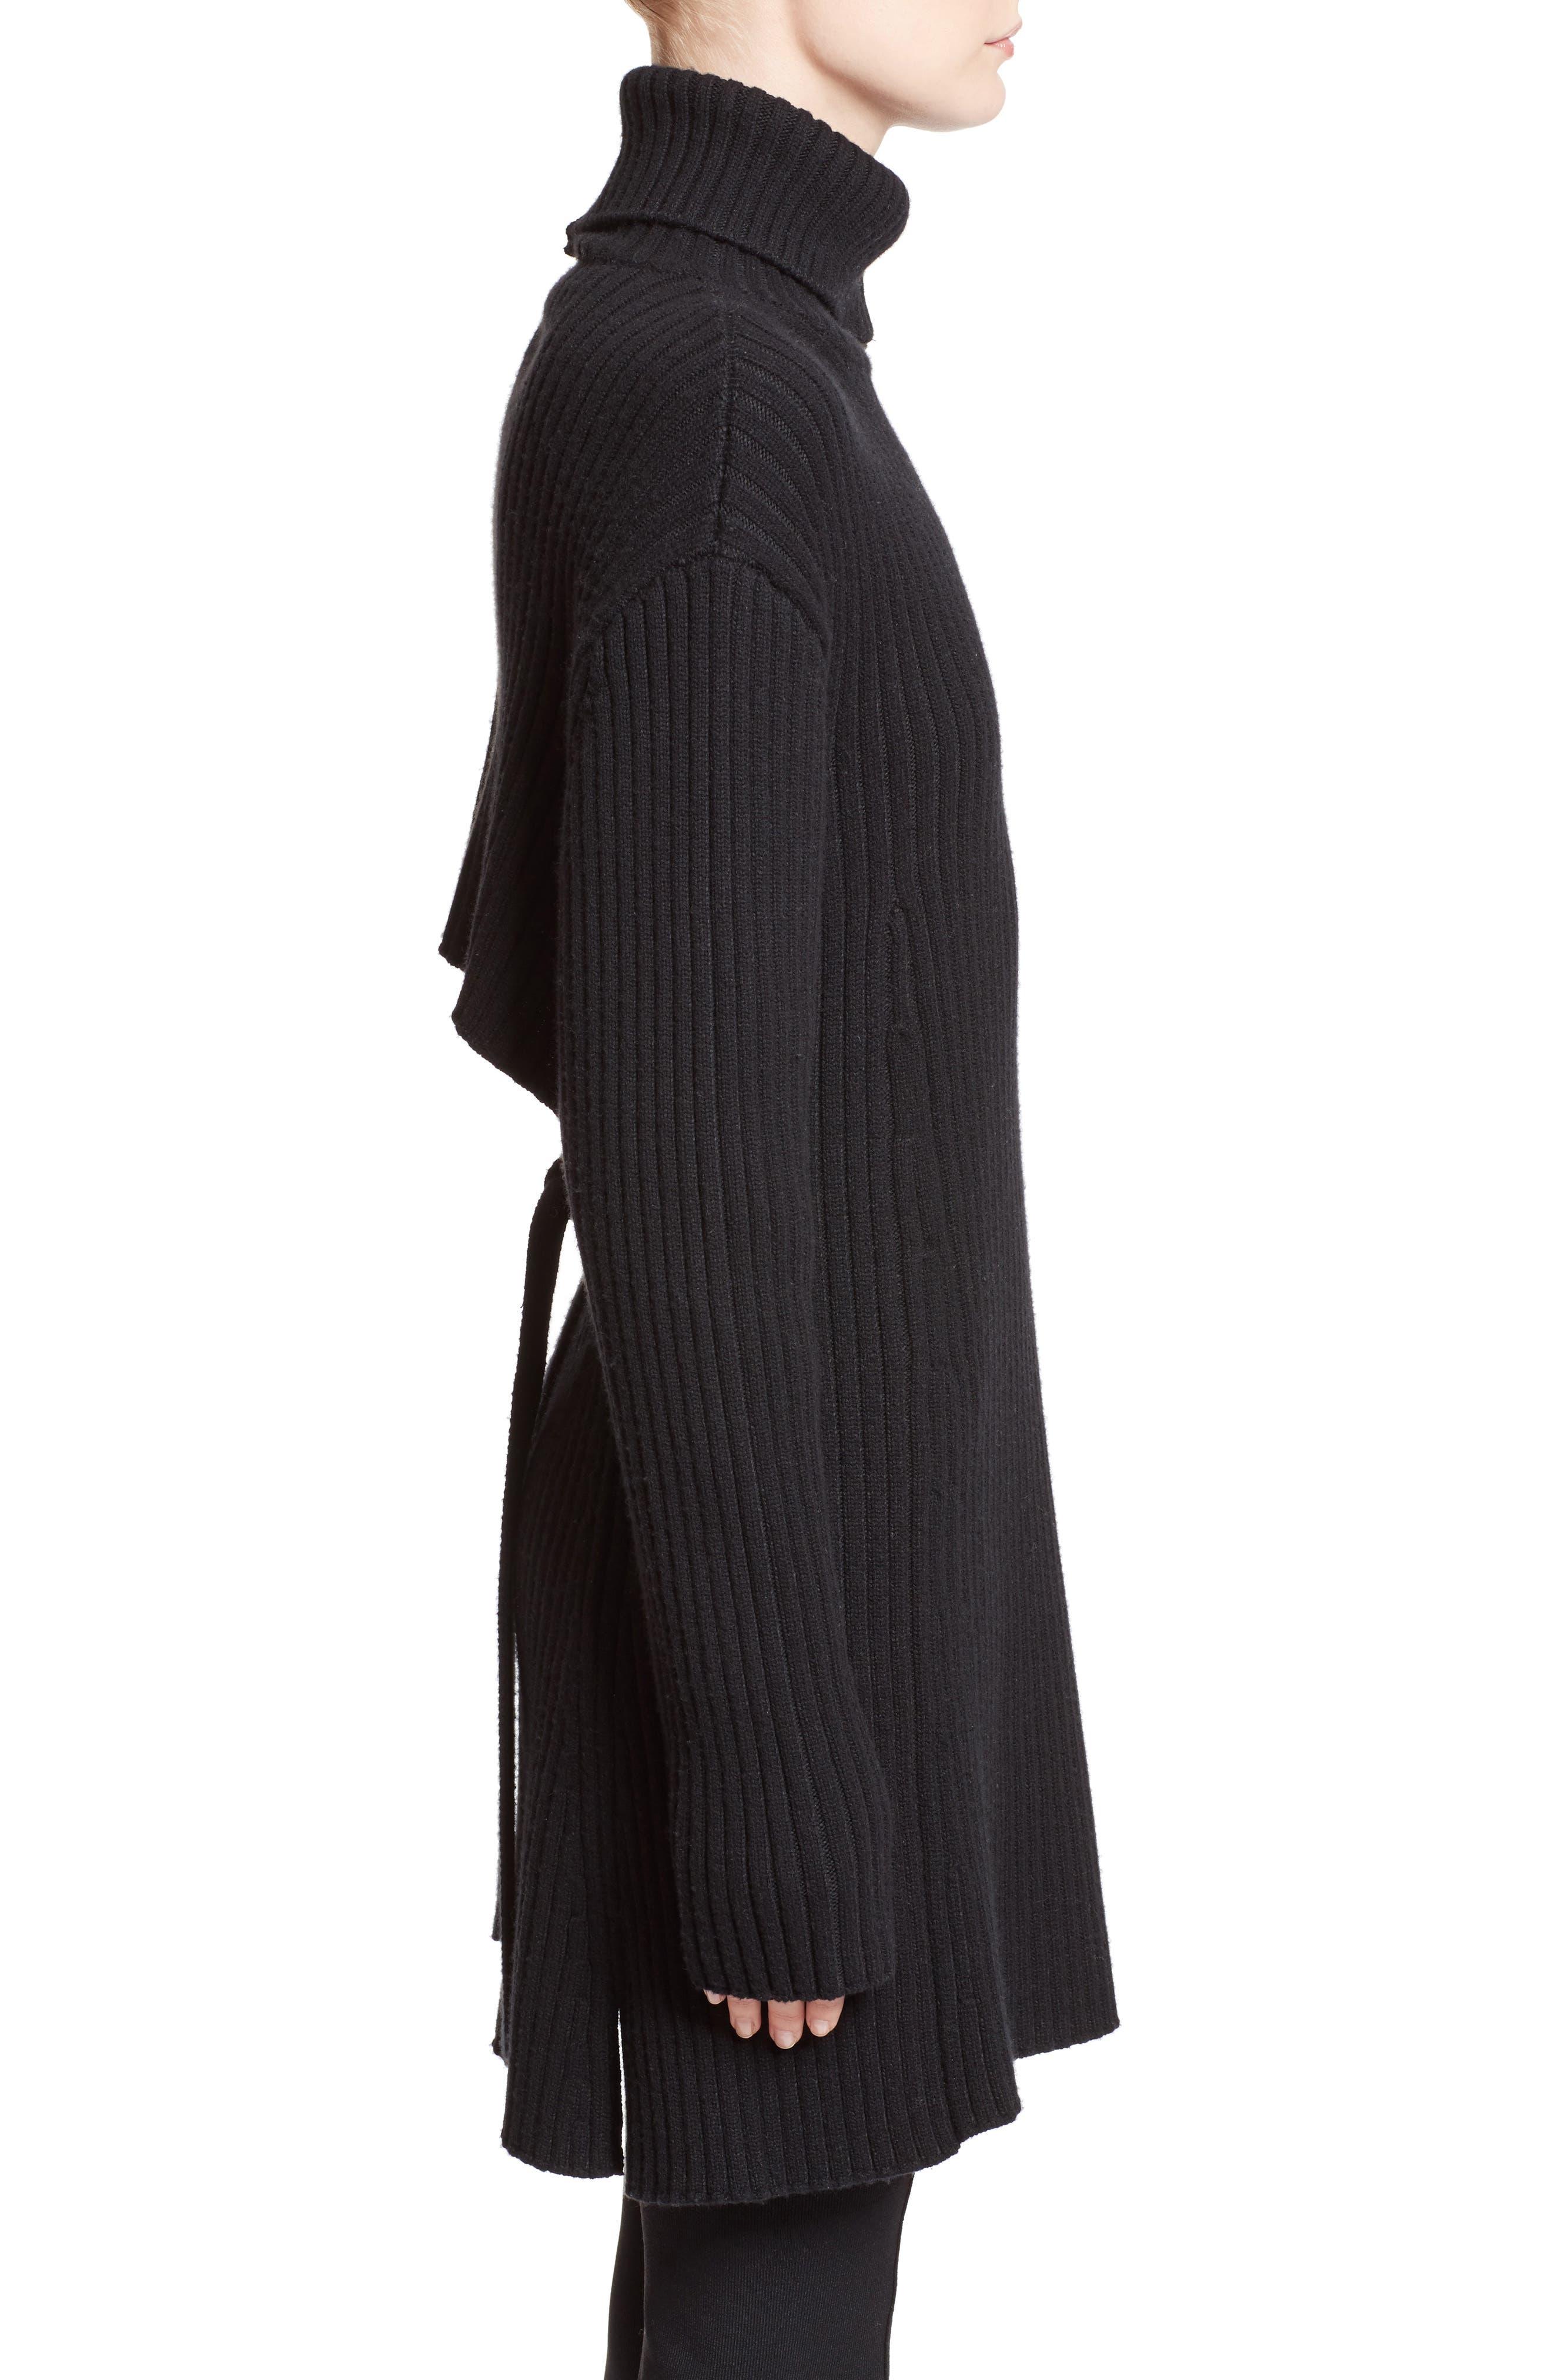 Wool & Cashmere Blend Turtleneck Dress,                             Alternate thumbnail 4, color,                             Black